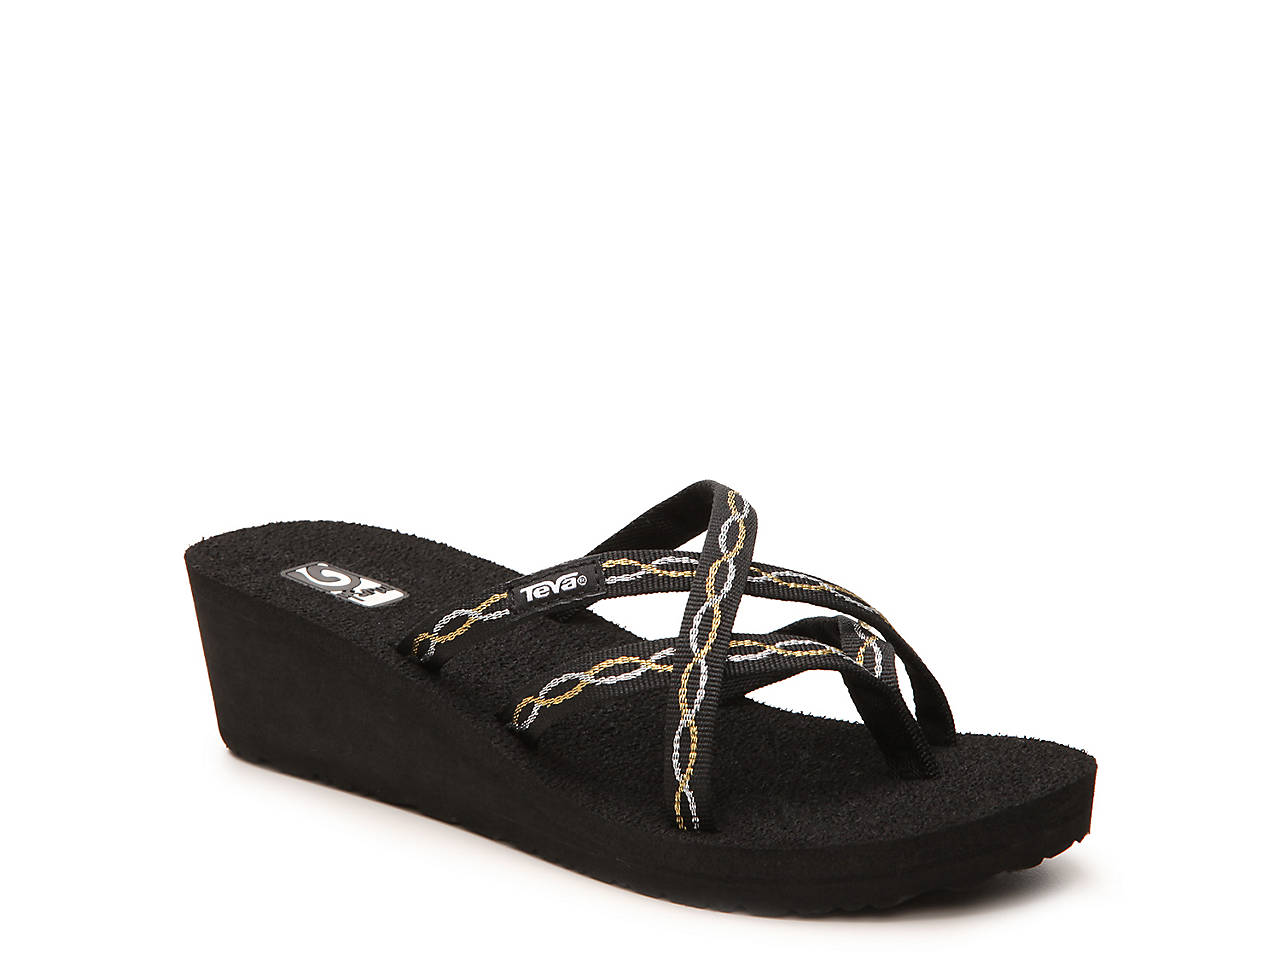 1a8f9b957d3a Teva New Mandalyn Ola Chain-link Wedge Sandal Women s Shoes